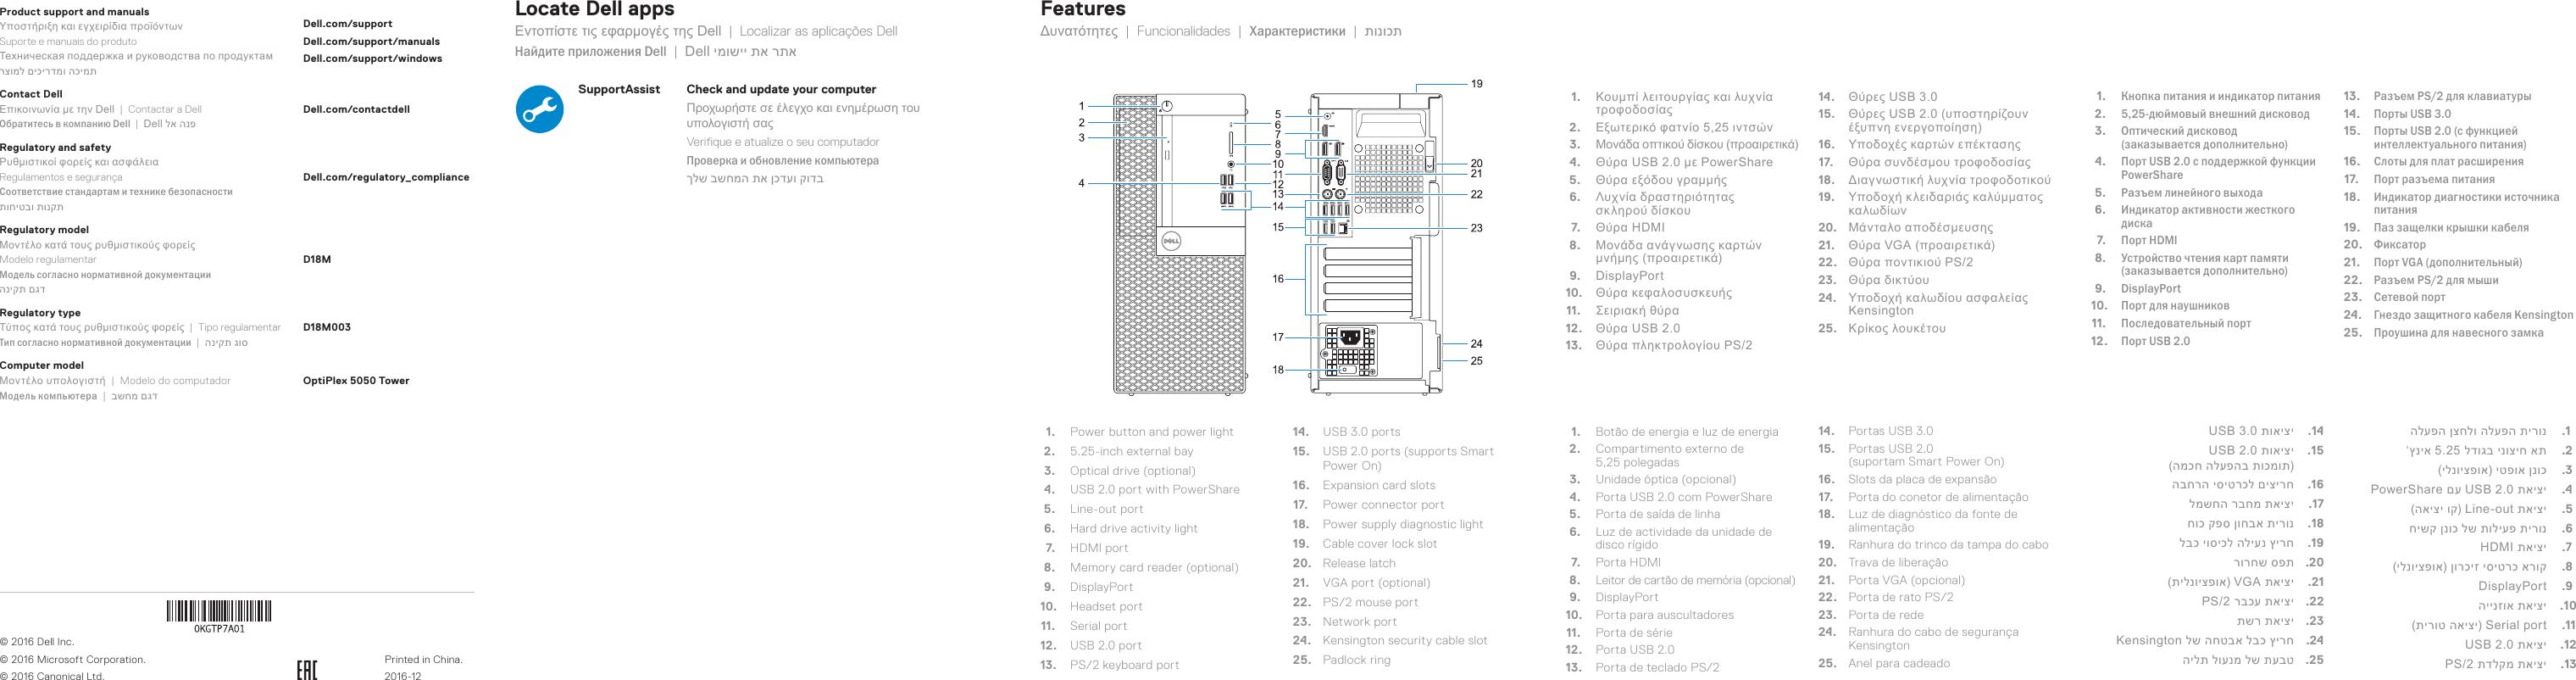 Dell OptiPlex 5050 Tower Инструкция по началу работы Windows 10